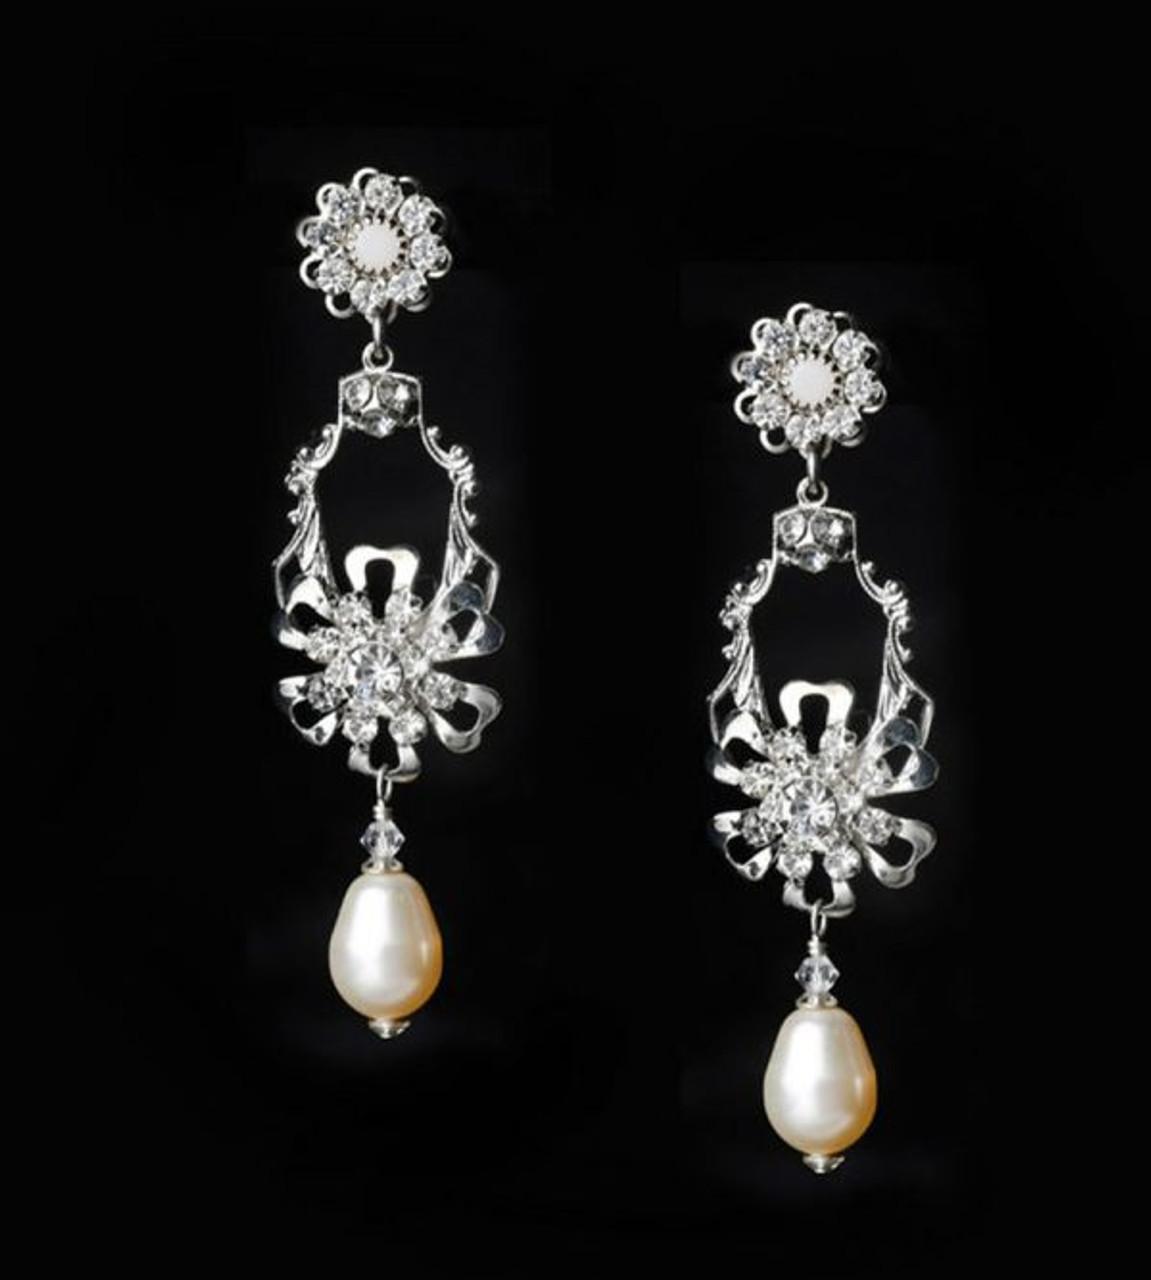 Erica Koesler Earring - Style J-9477